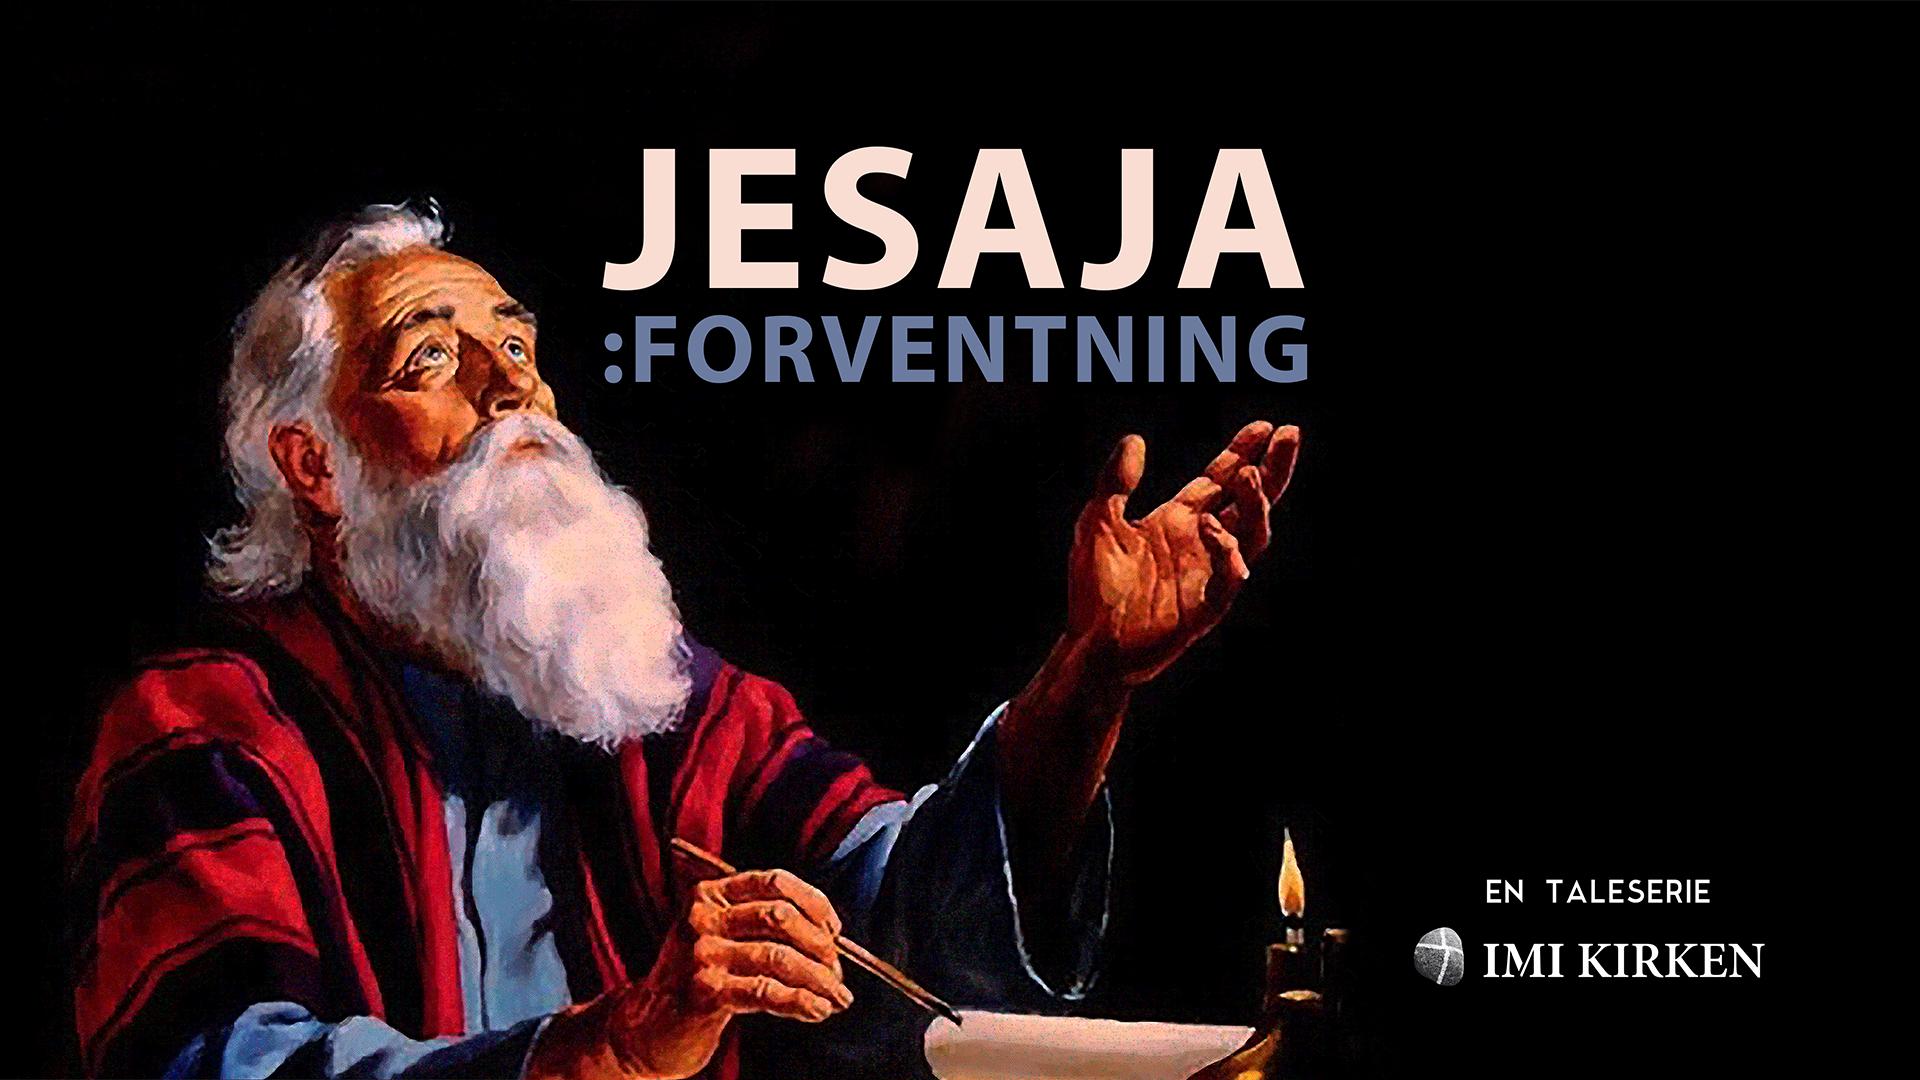 JESAJA-FORVENTNING-Taleserie høsten 2017-storskjerm.jpg